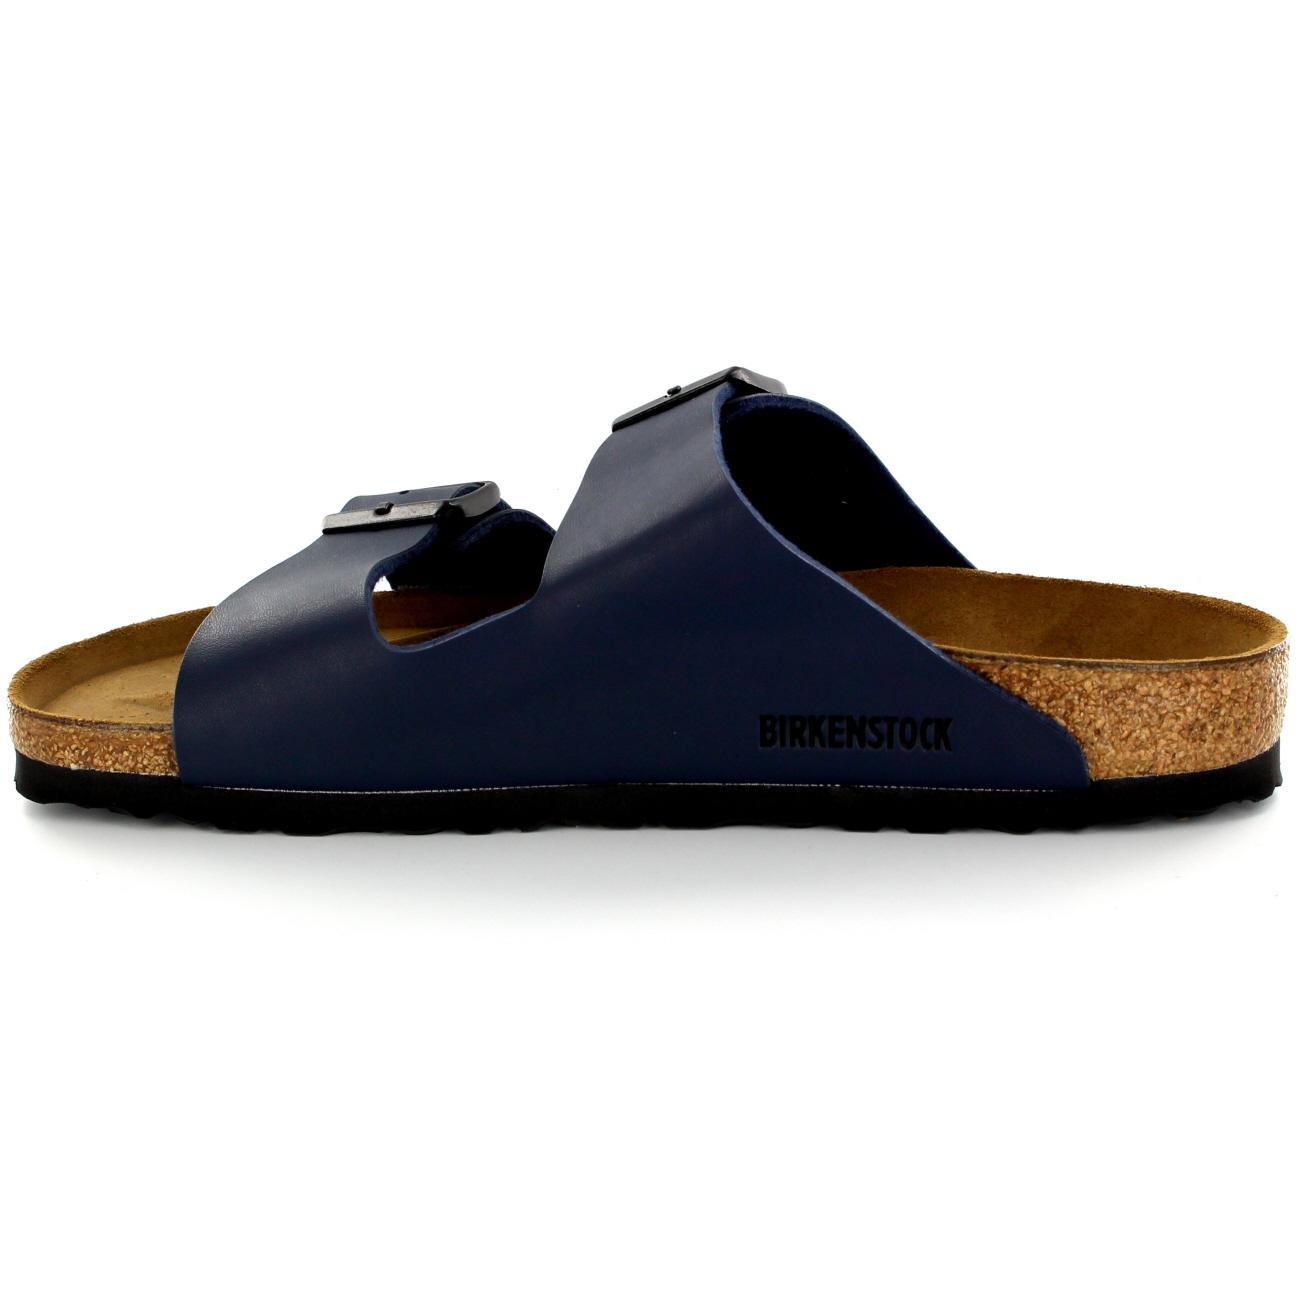 Mens Birkenstock Arizona Leather UK Buckle Summer Holiday Beach Sandals UK Leather 6-13 41c38a